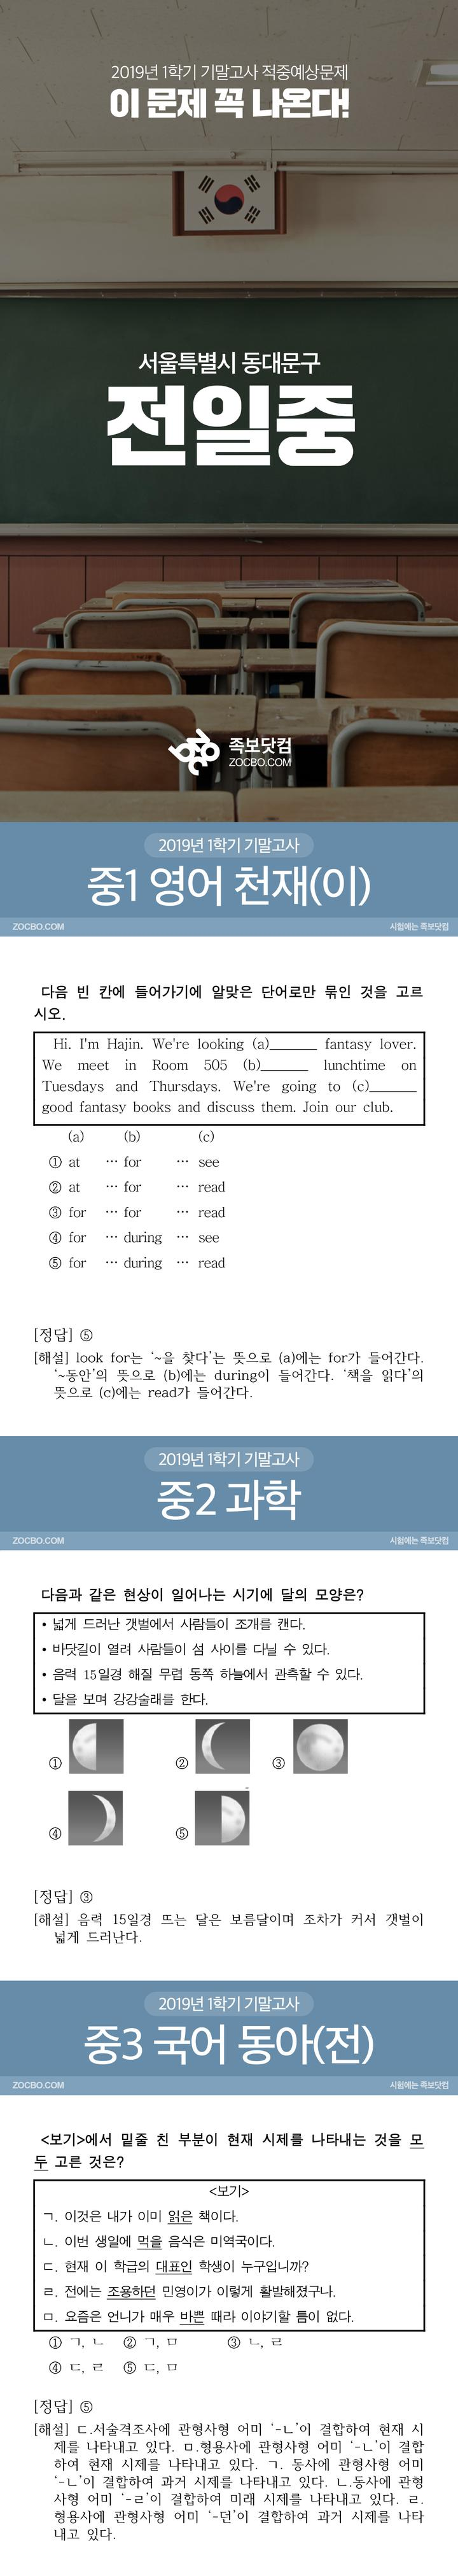 images on organization : 족보닷컴